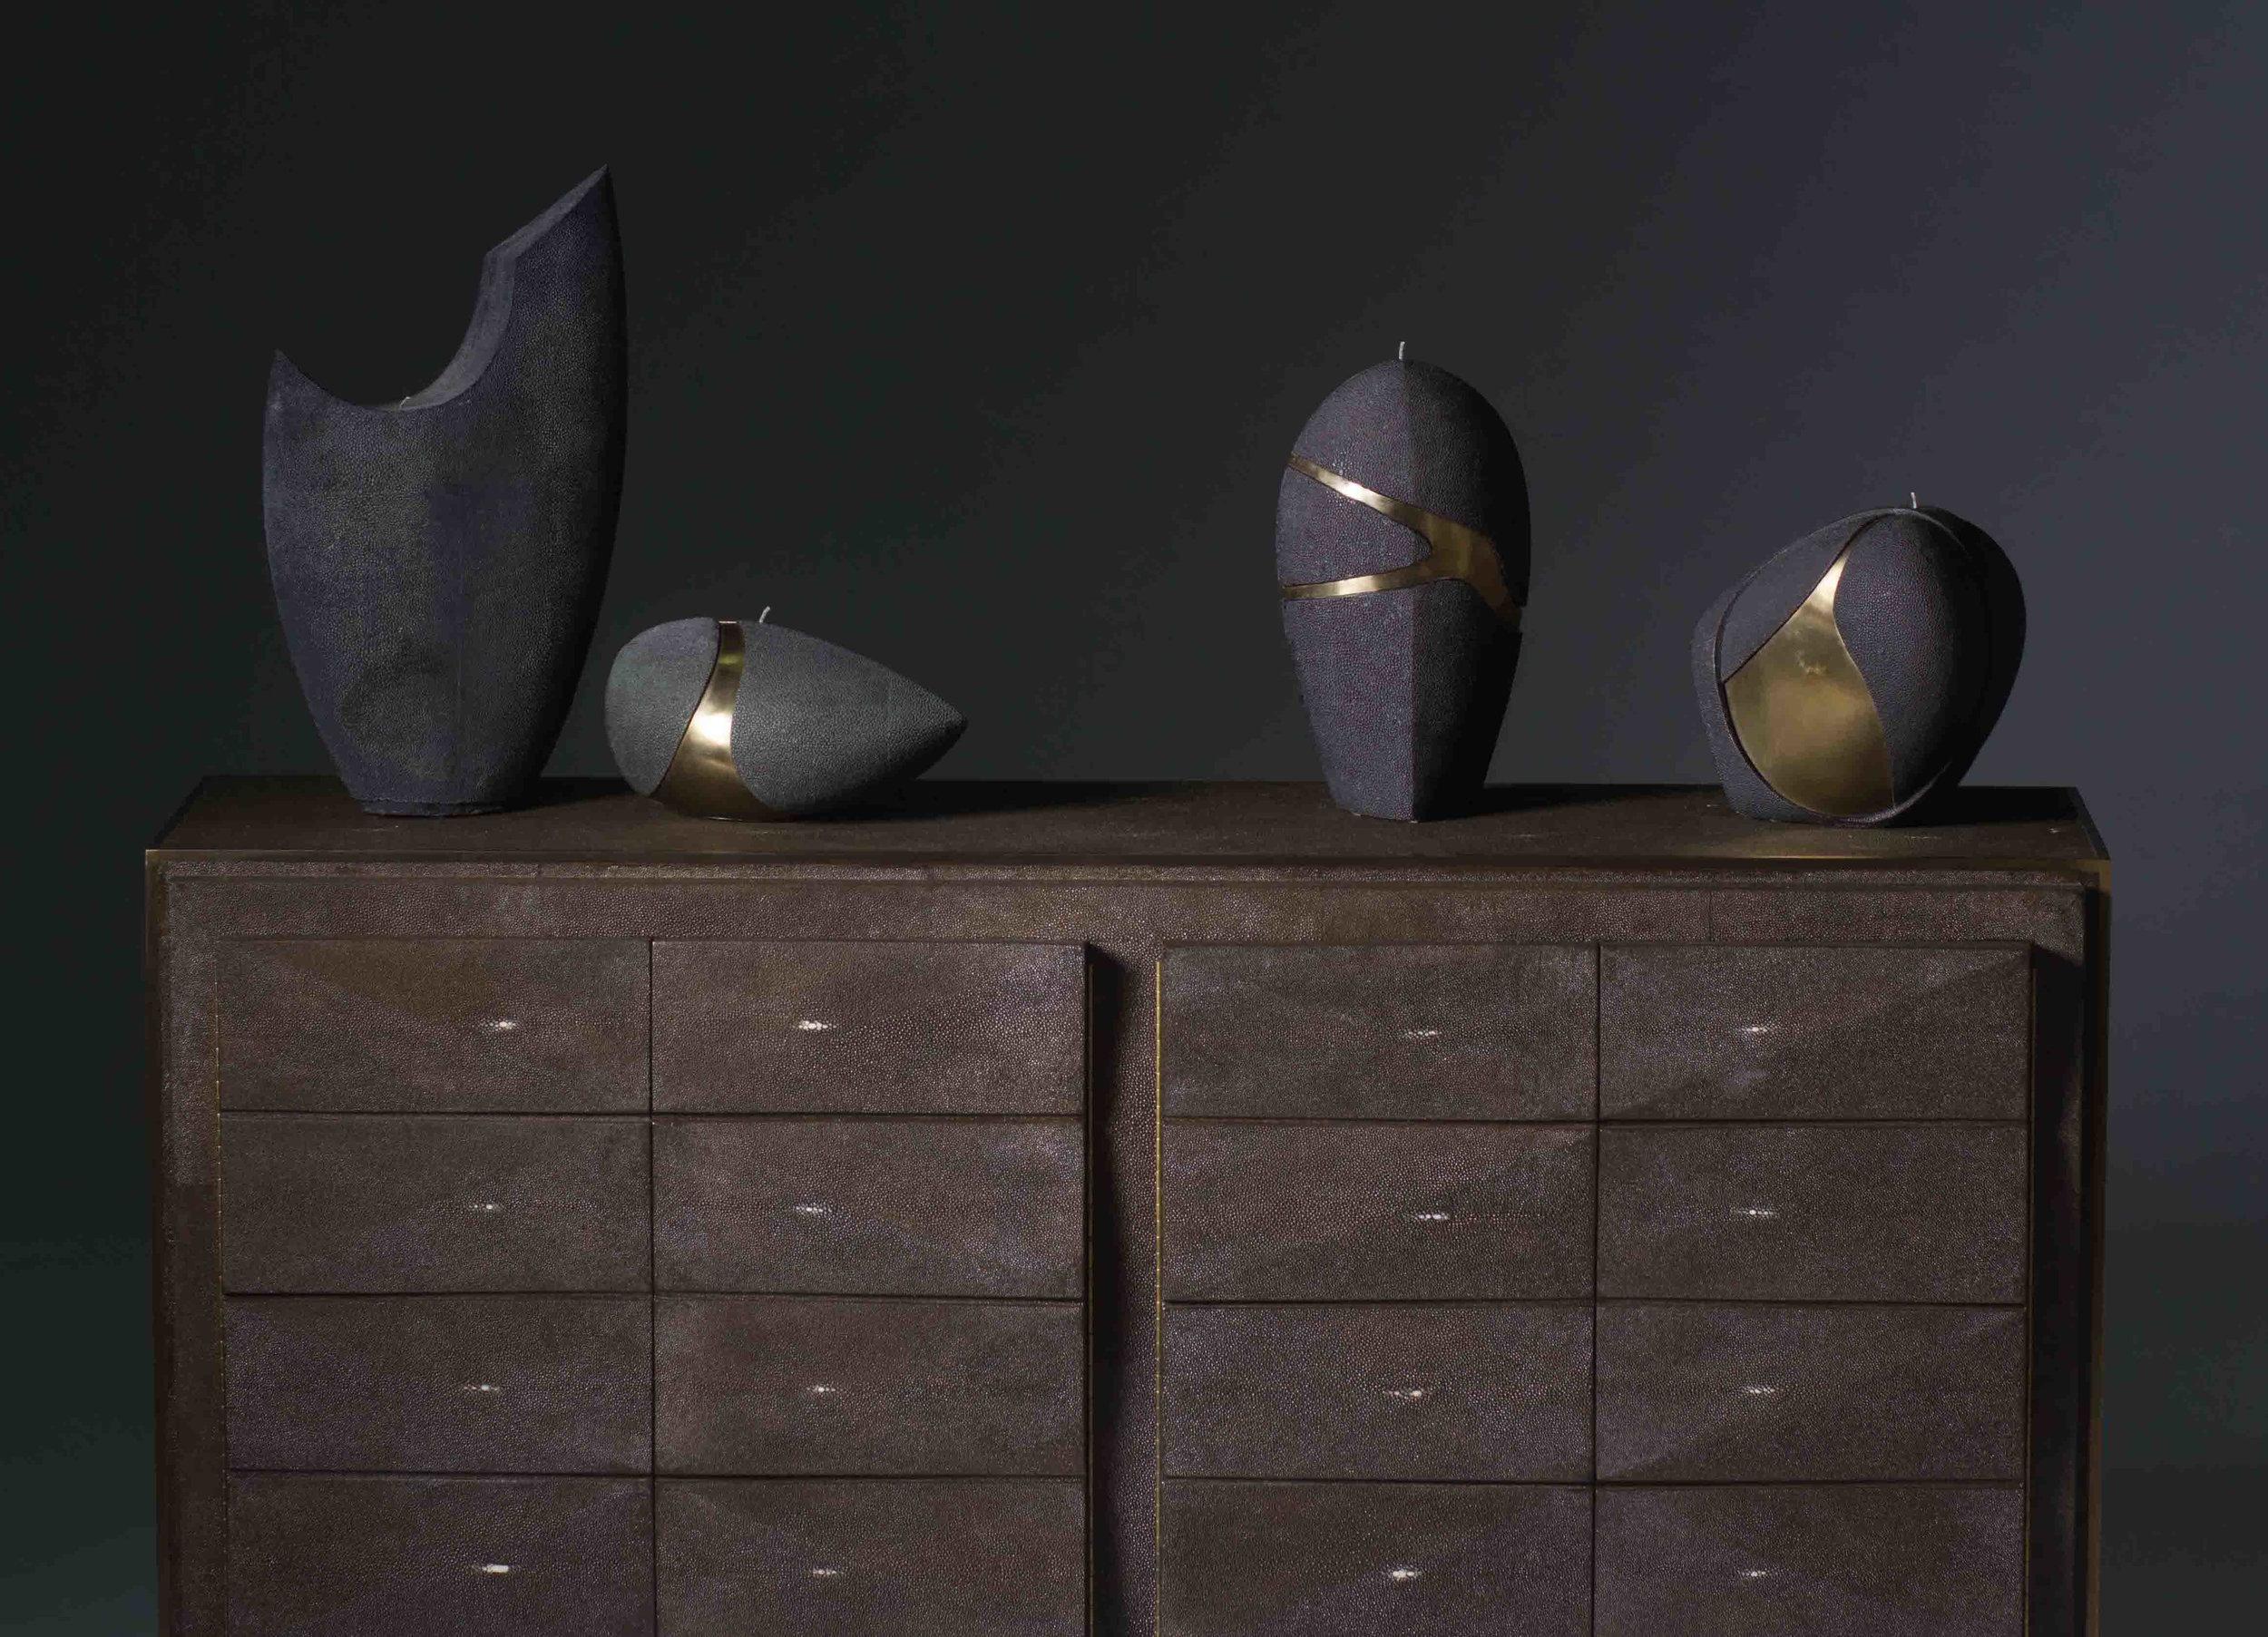 Patrick-coard-paris-sculptural-candles-shagreen-texture.jpg